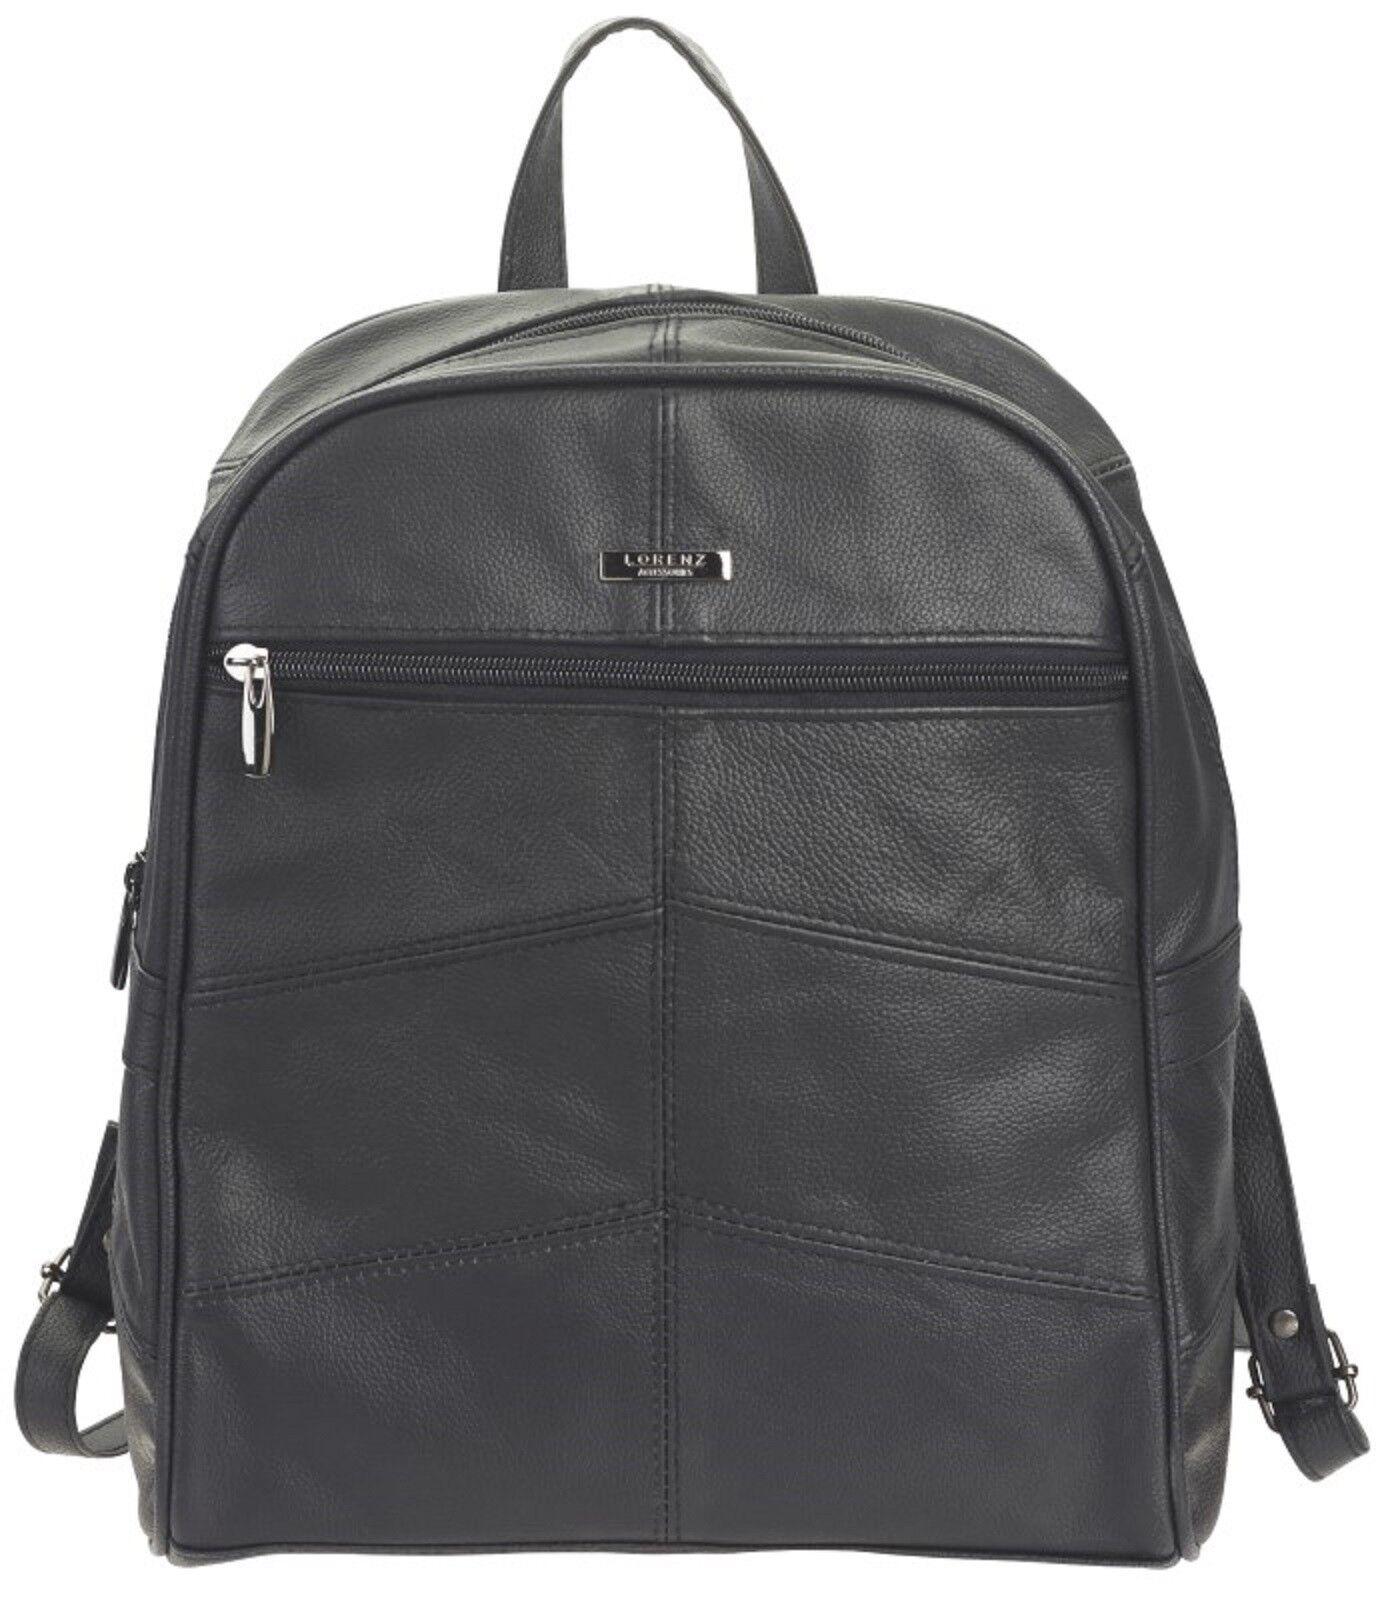 1e460e740a Lorenz Ladies womens Large Genuine Black Leather Backpack Rucksack ...